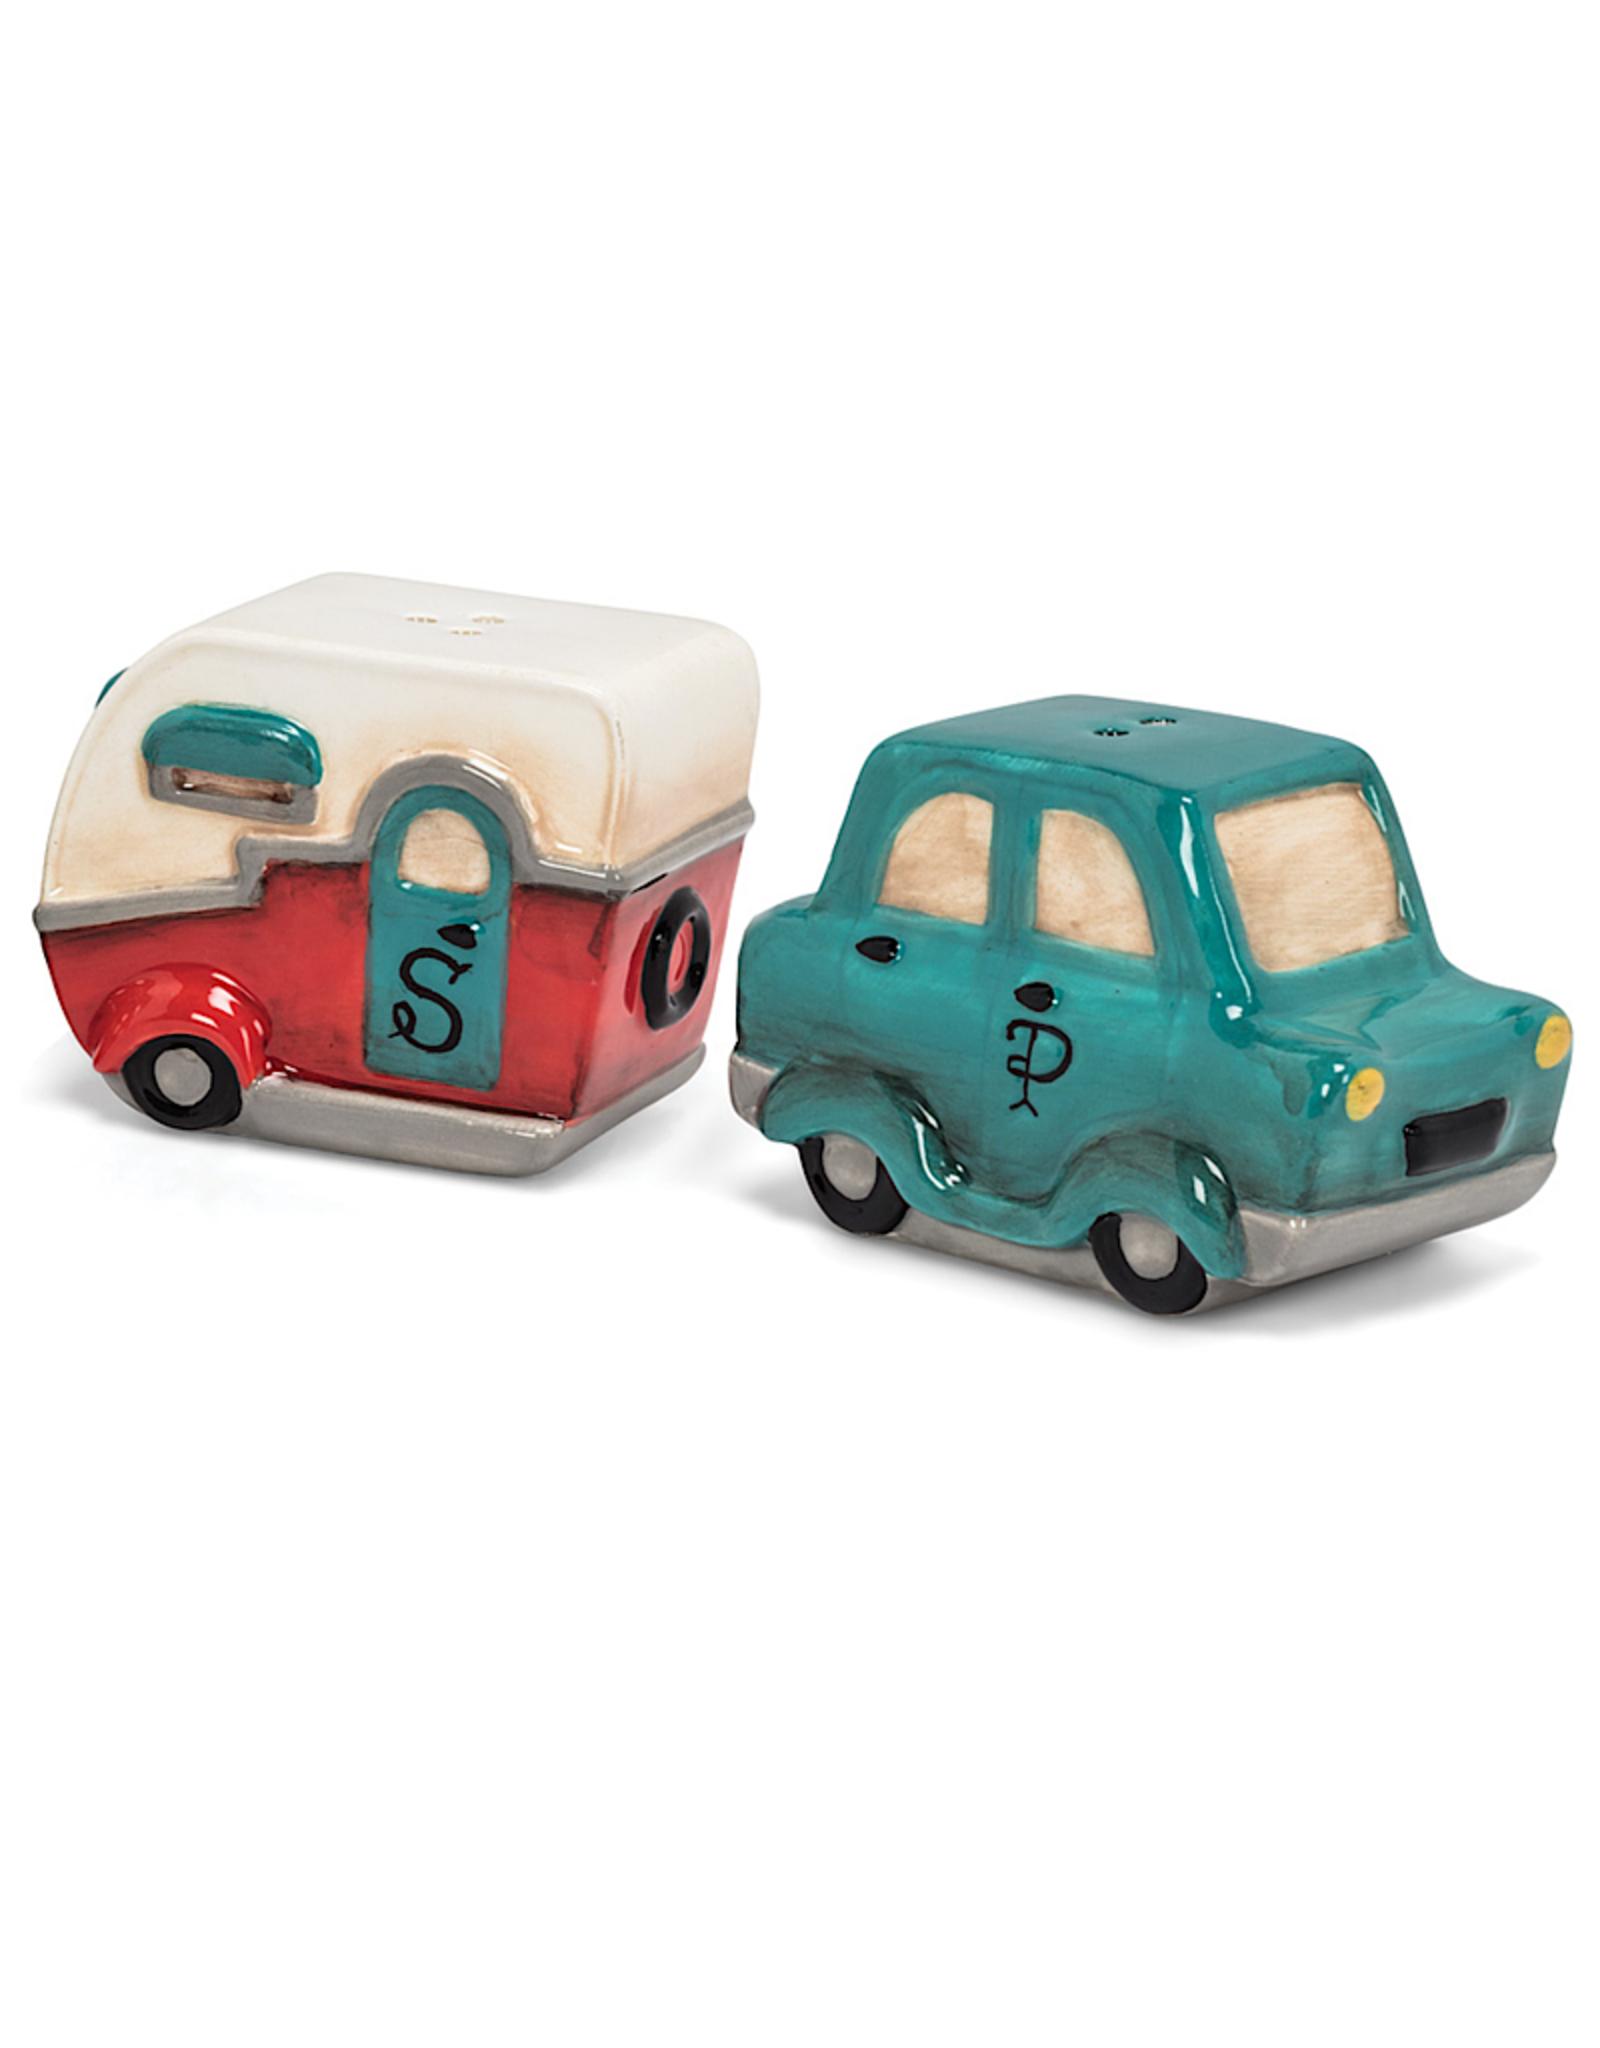 Car & Camper Salt & Pepper Shaker